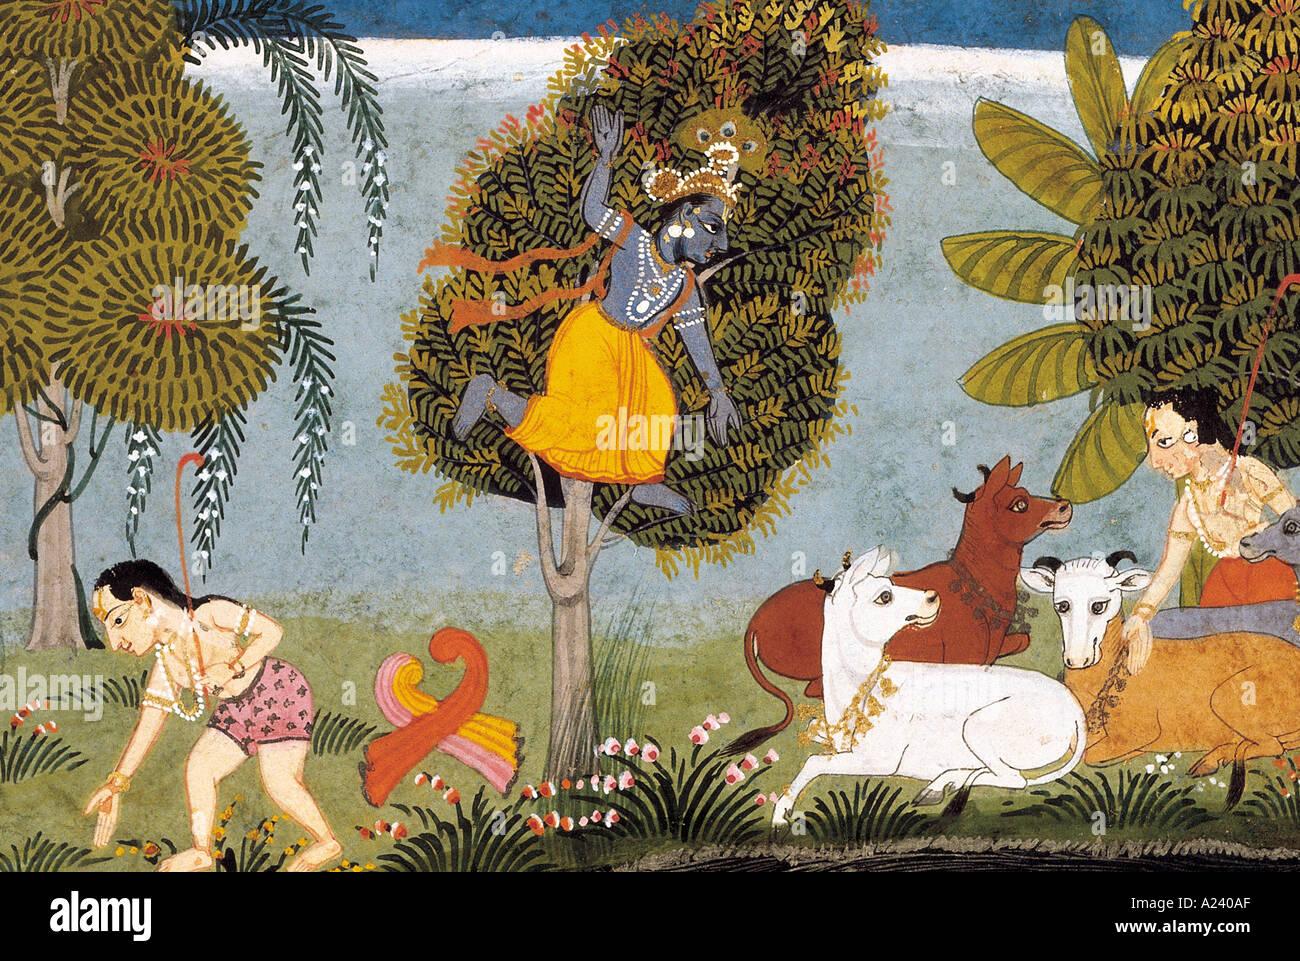 Krishna subdues Kaliya. Scene from the Bhagavata Purana. Mewar, Rajasthan, India. Dated: 1725 A.D. - Stock Image